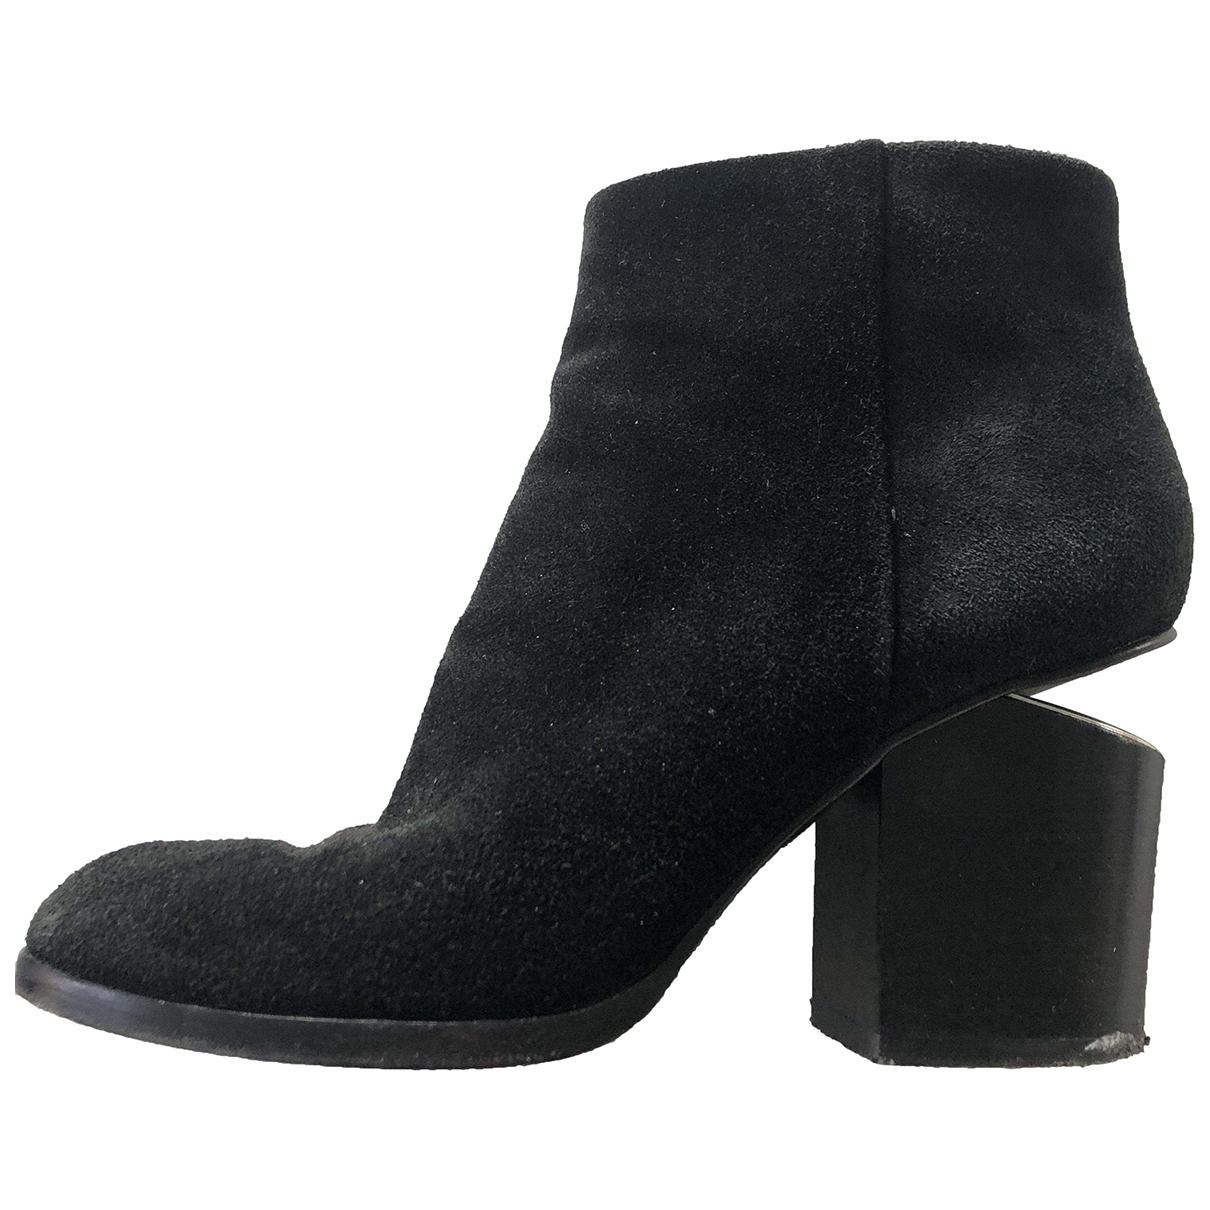 Alexander Wang Kori Black Suede Ankle boots for Women 38.5 EU